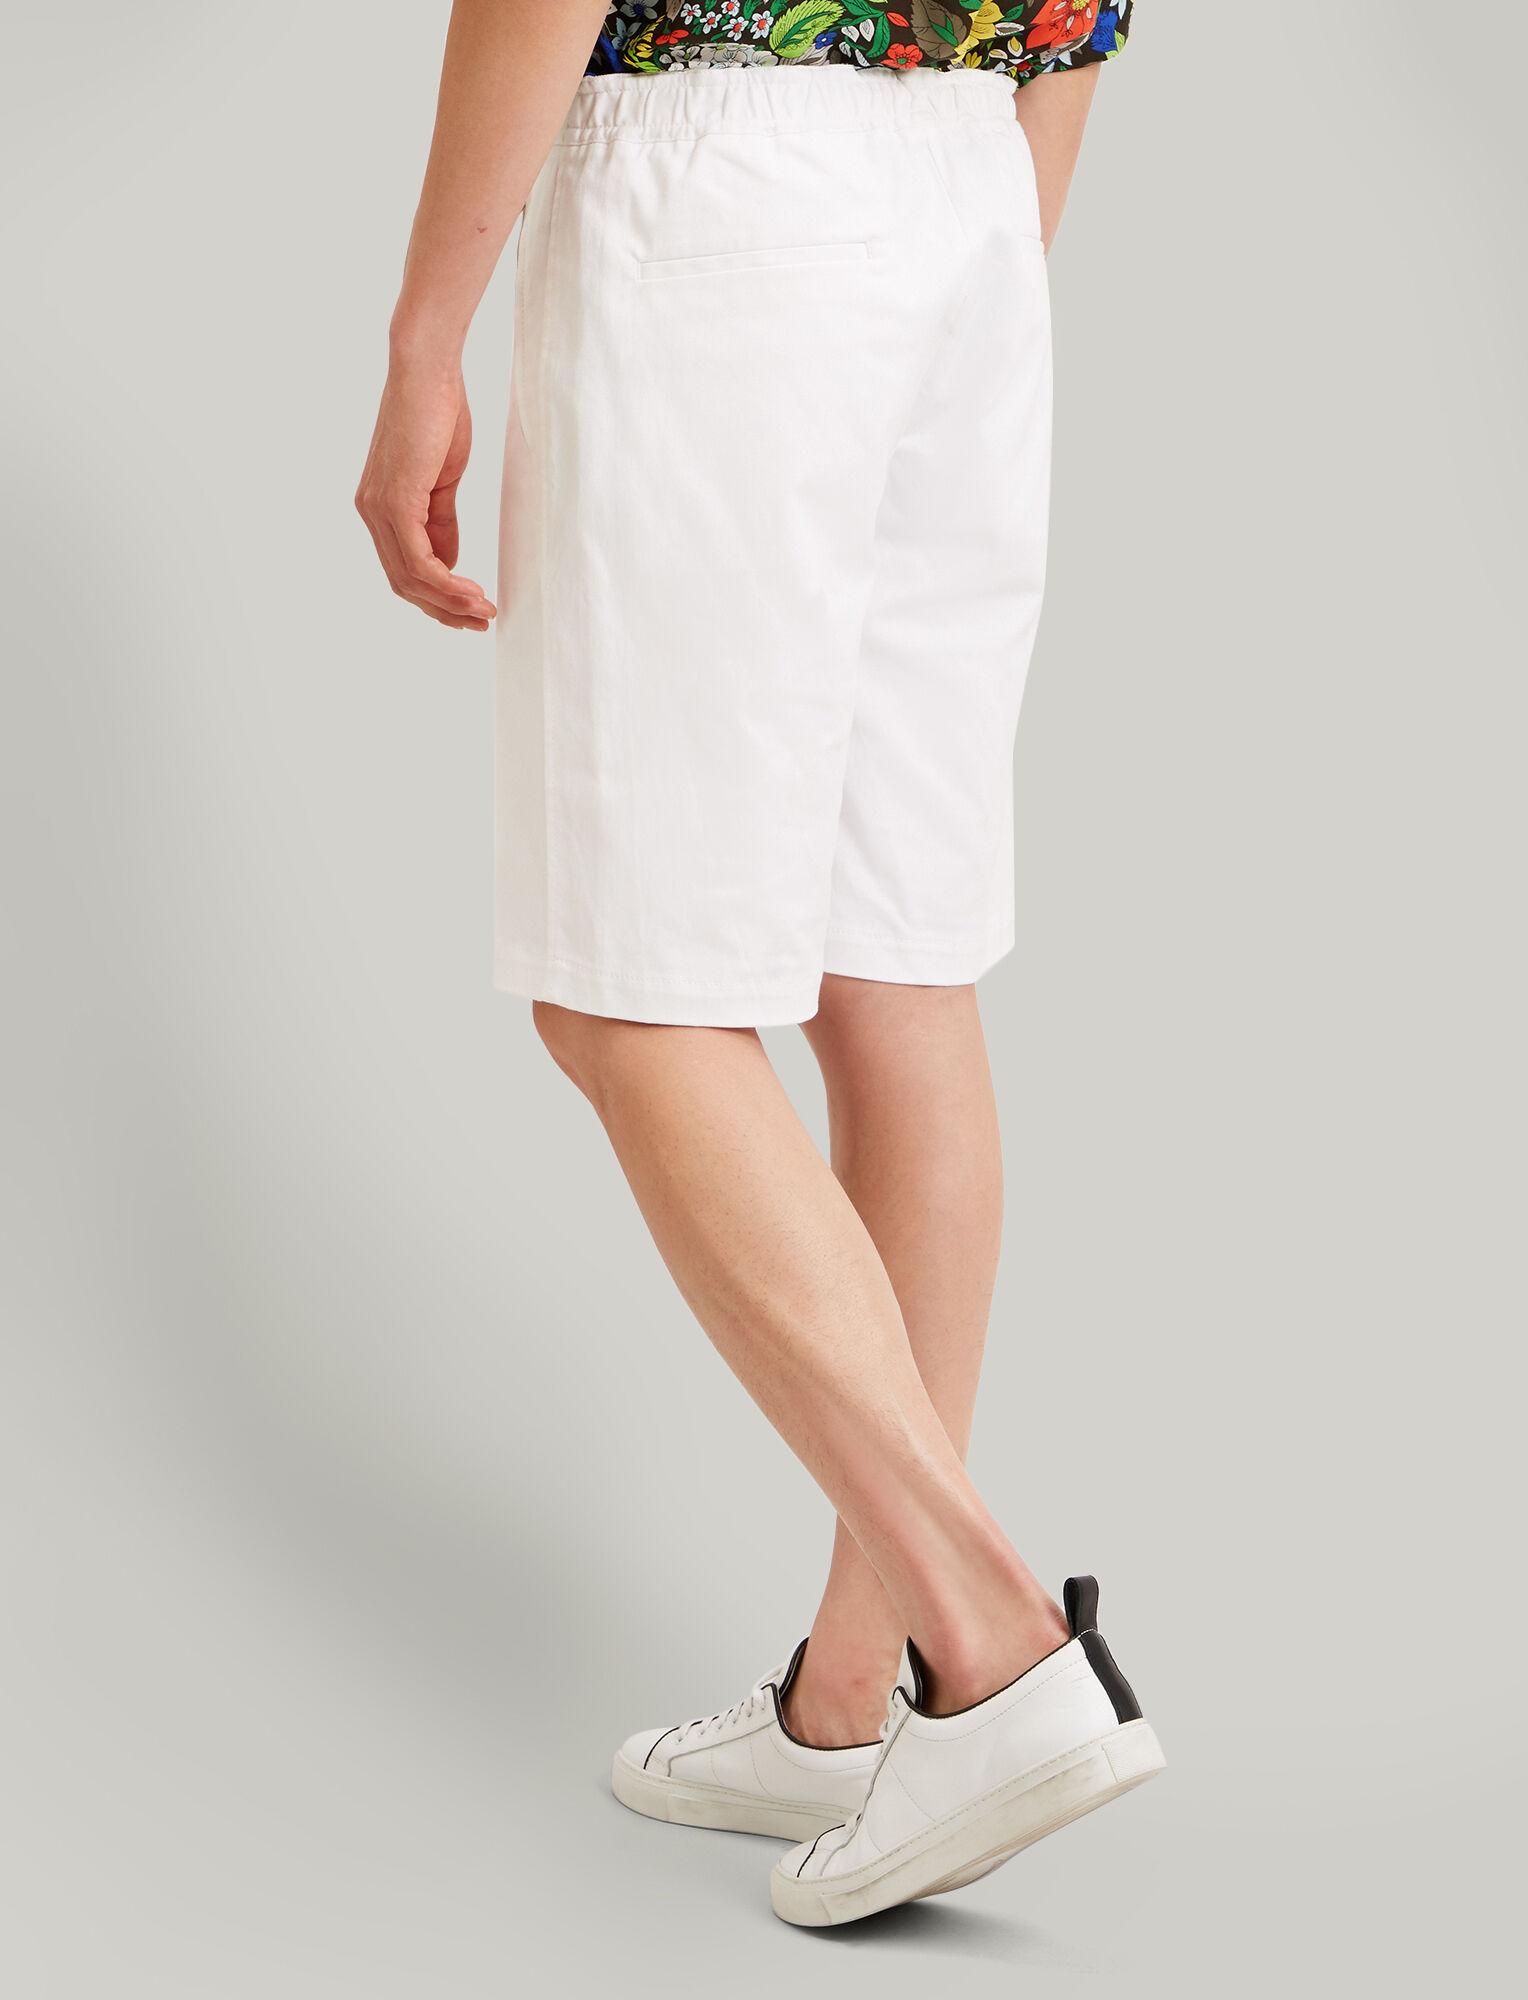 Joseph, Pins Cotton Drill Stretch Shorts, in OFF WHITE